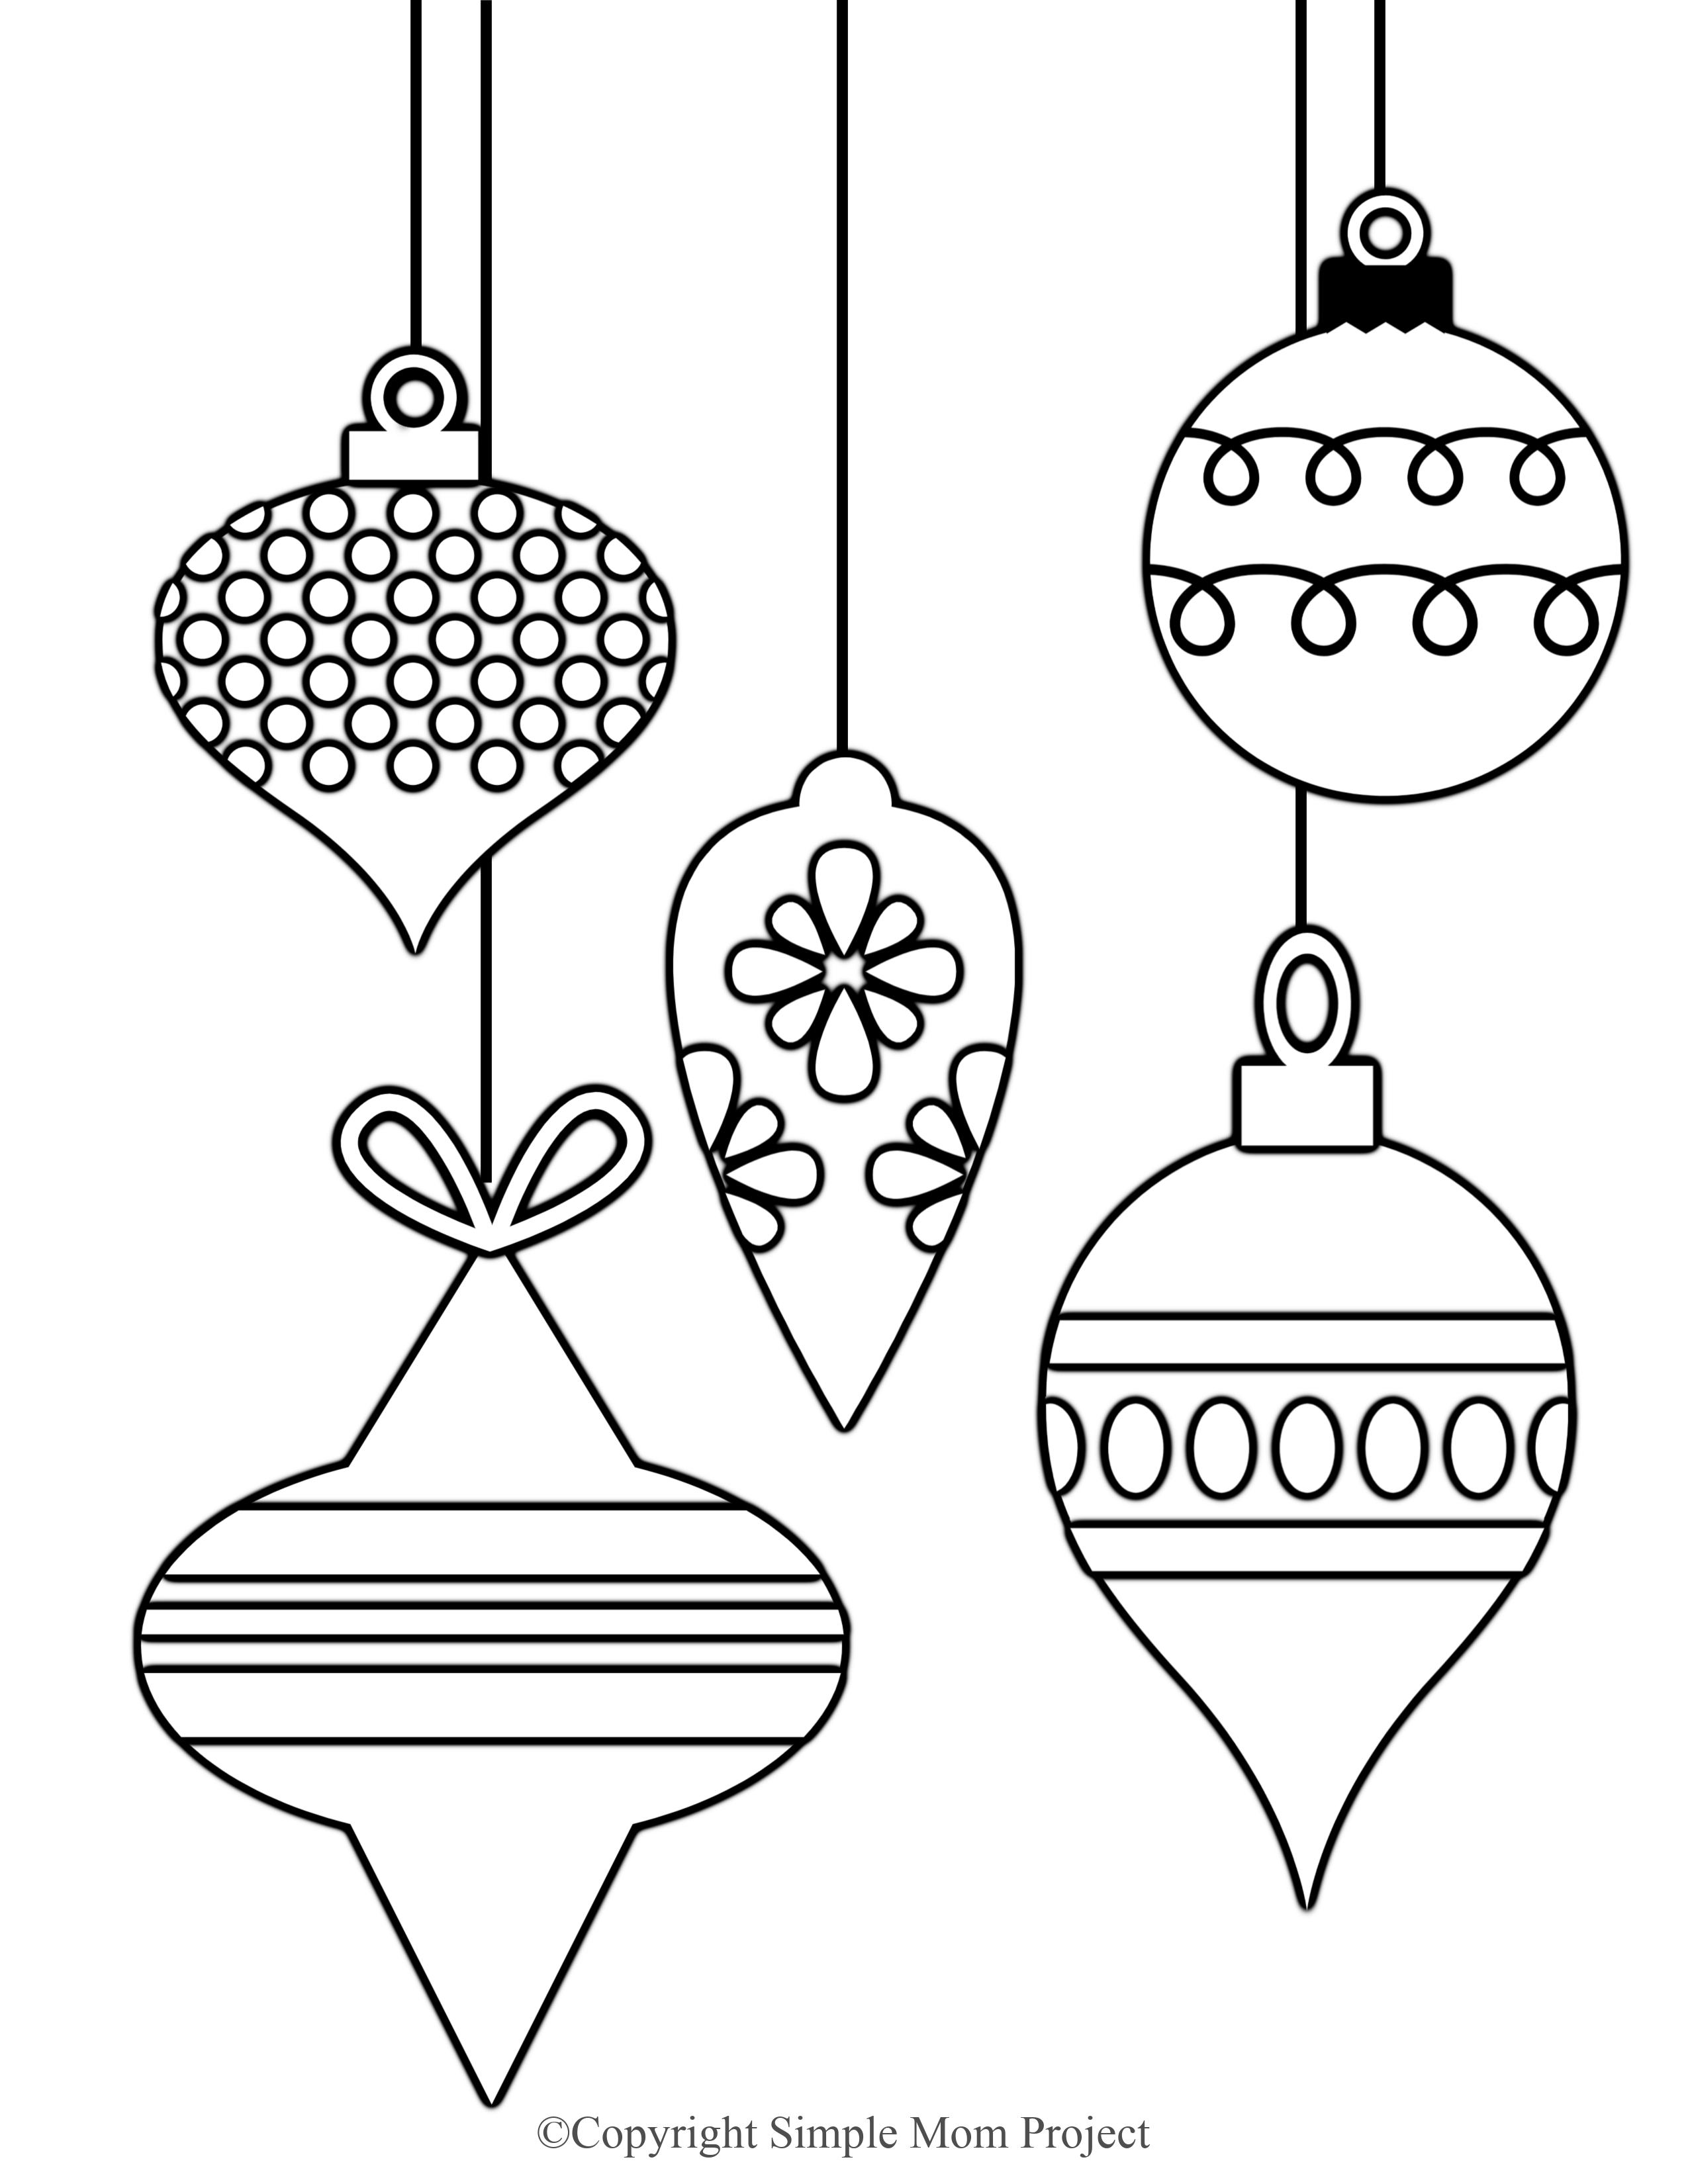 30 Free Printable Large Snowflake Templates  Christmas coloring